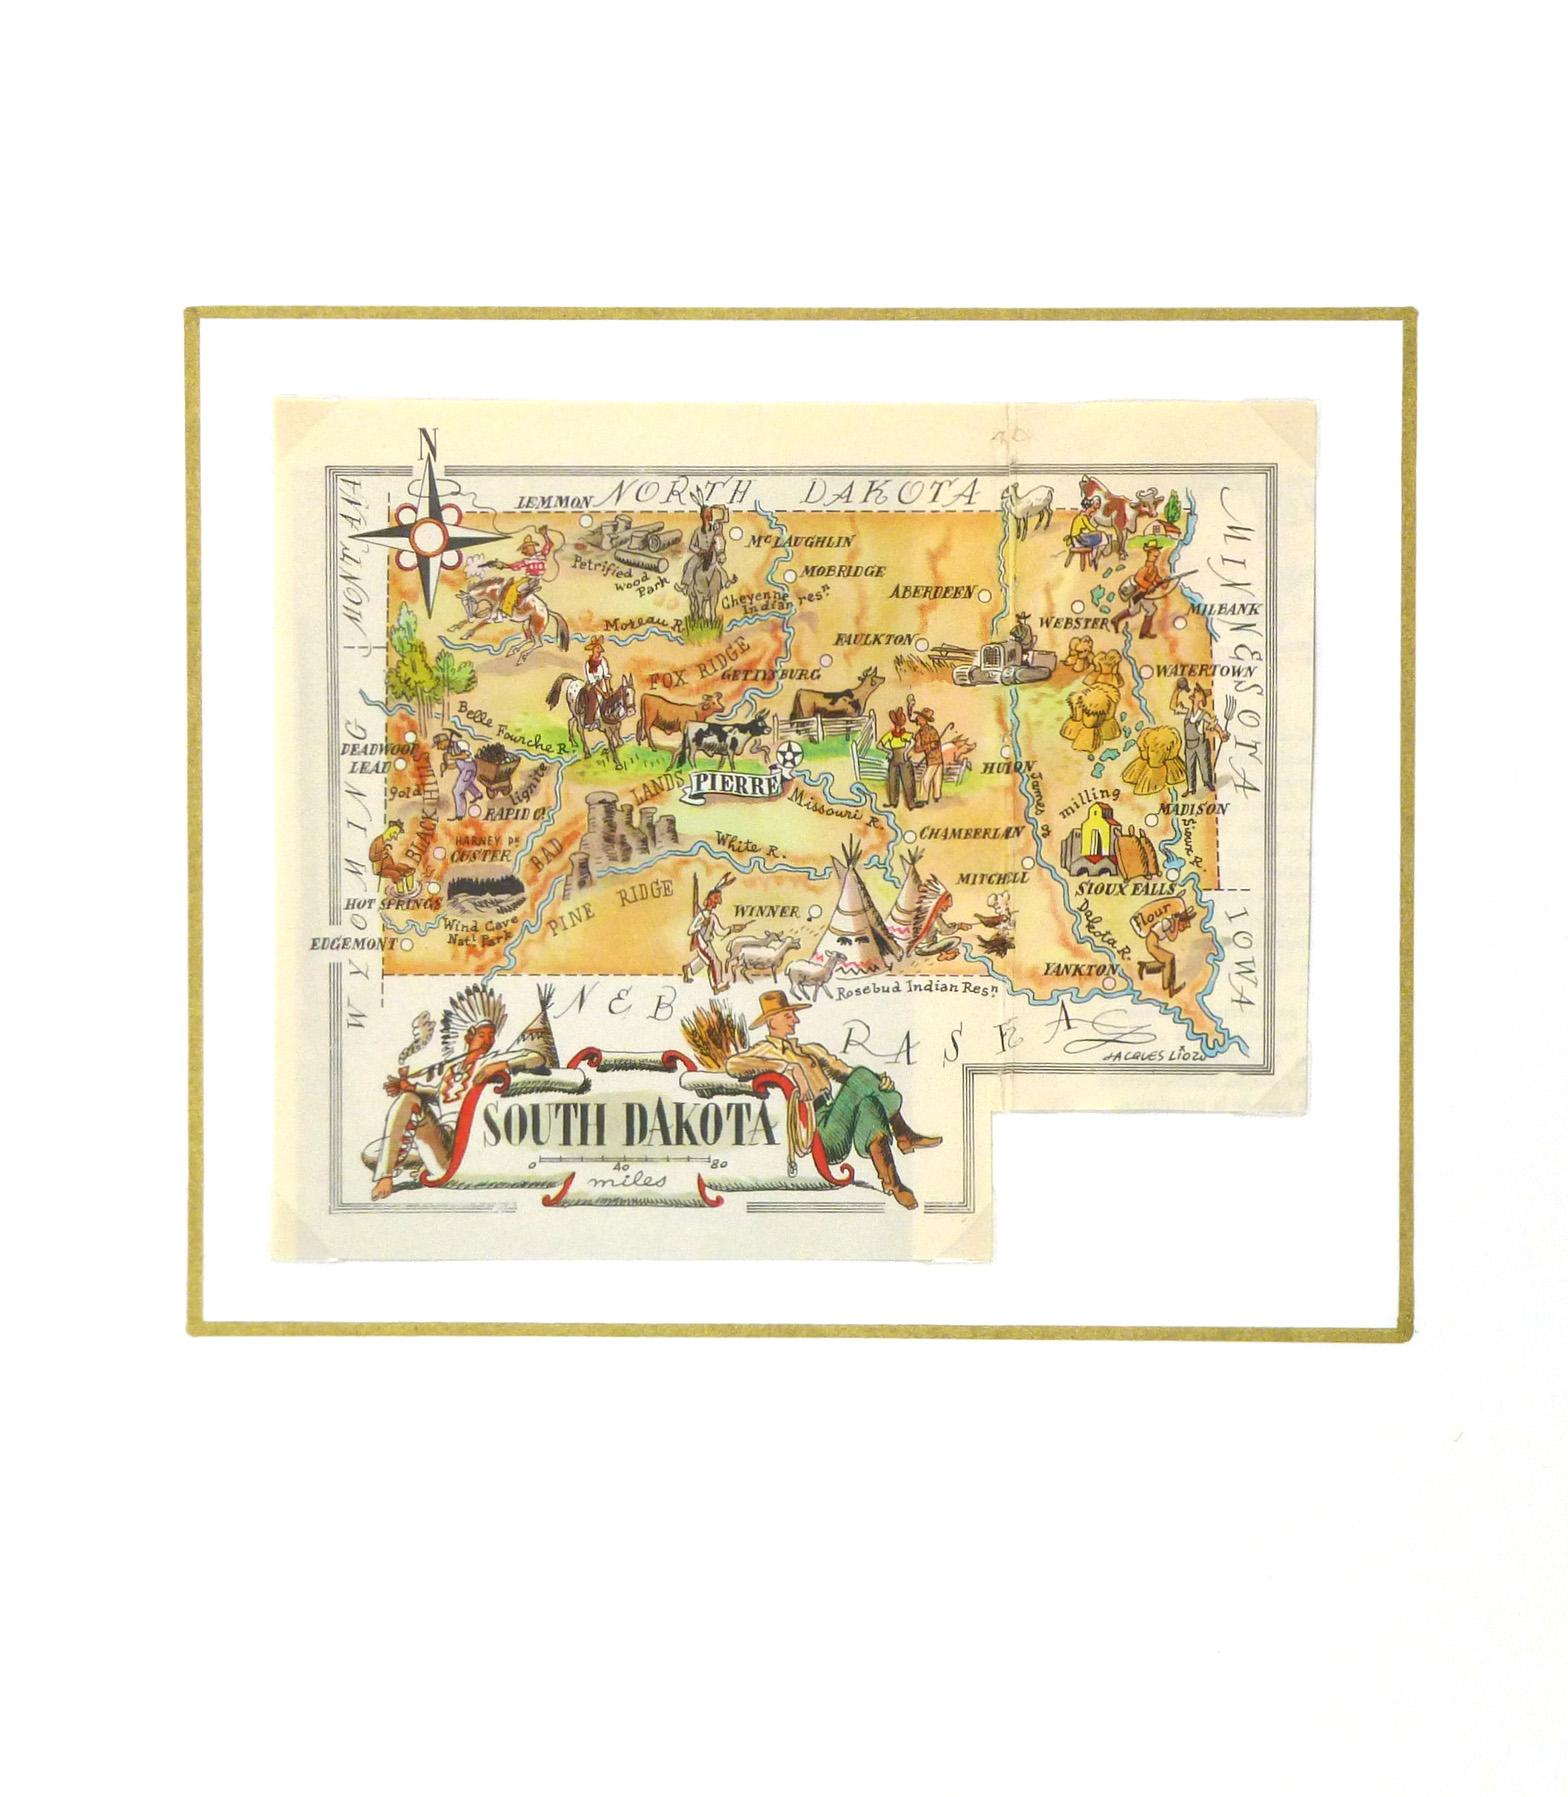 South Dakota Pictorial Map, 1946-matted-6266K